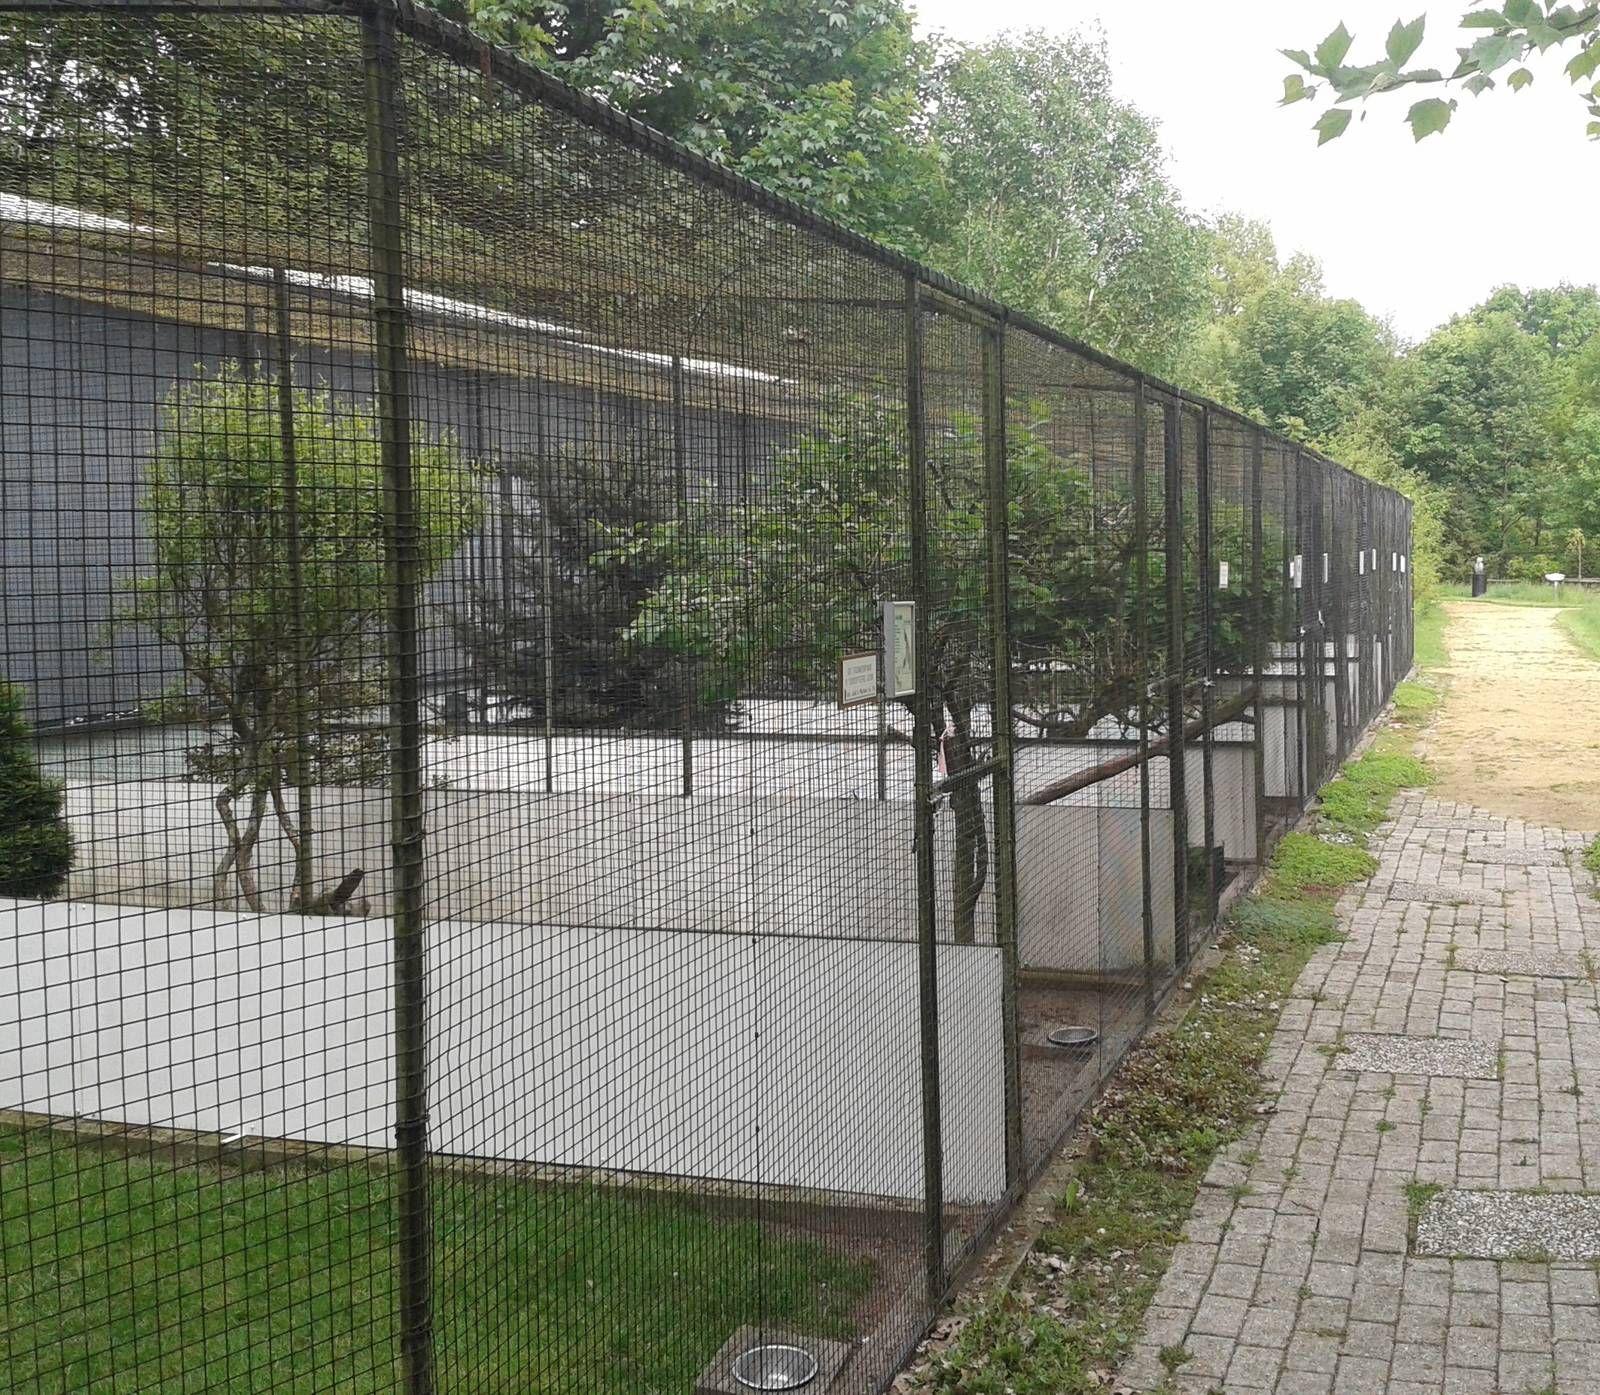 Netherlands > Fazanterie de Rooie Hoeve   Aviaries & Exhibits ...